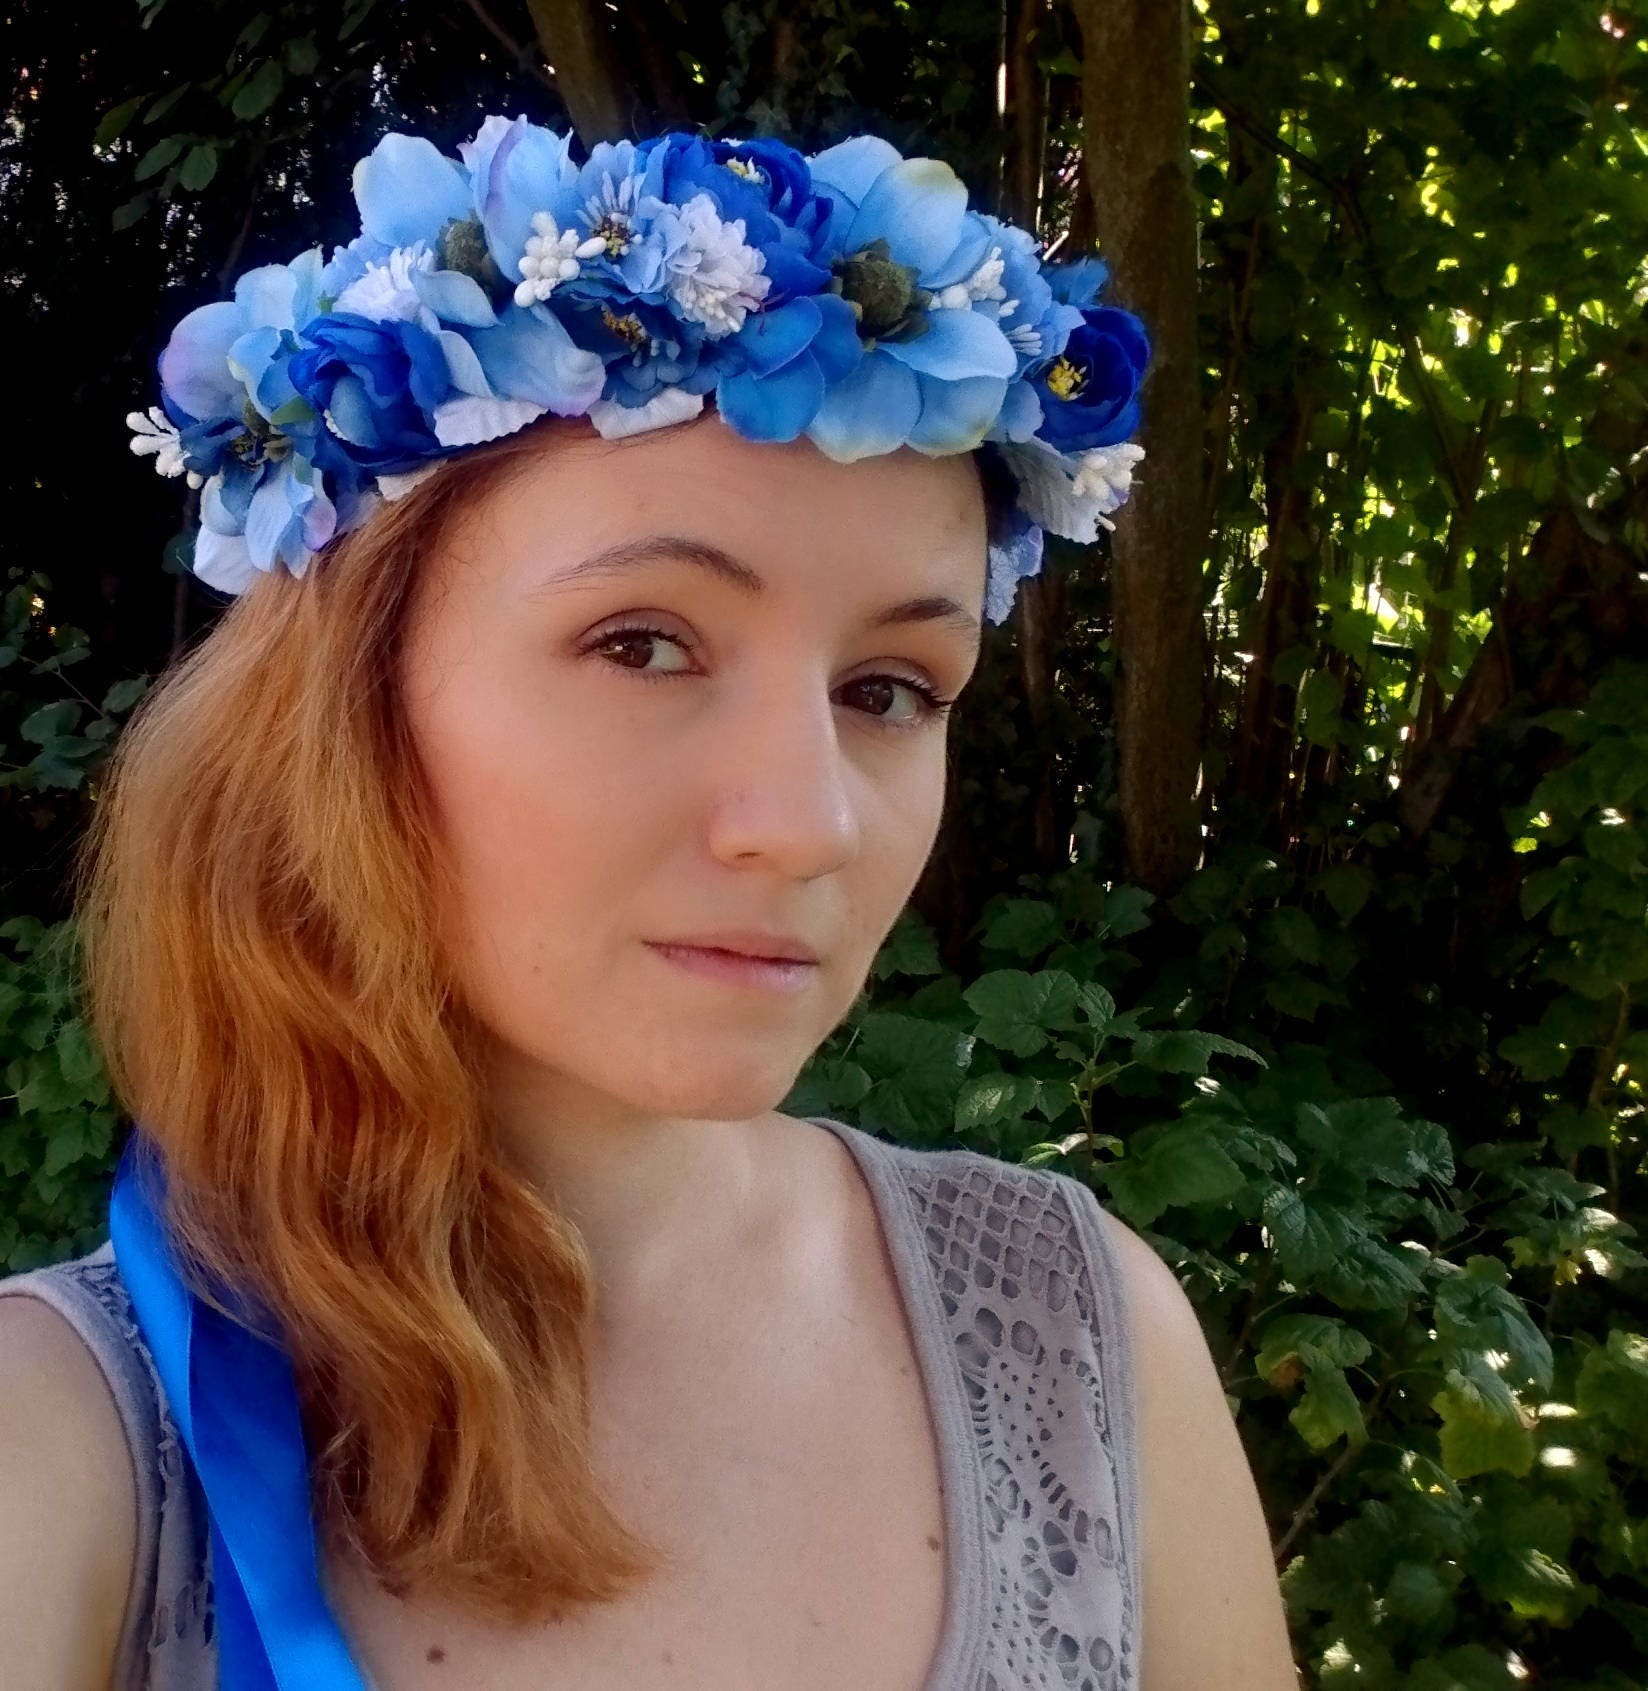 Blue flower crown wreath artificial flowers wedding royal blue gallery photo gallery photo gallery photo gallery photo izmirmasajfo Image collections